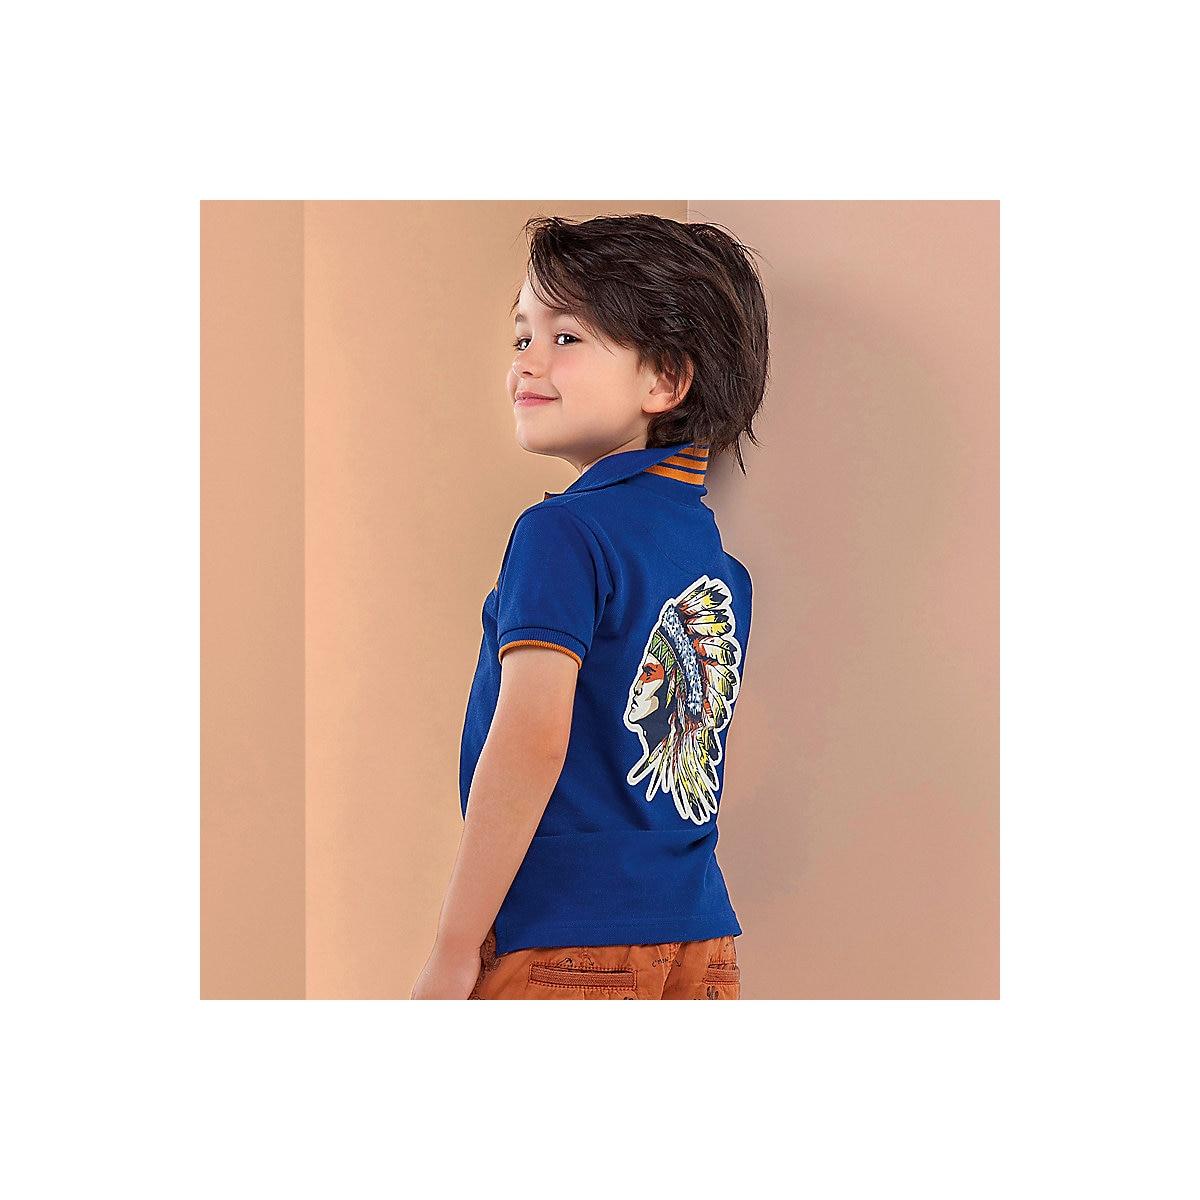 MAYORAL Polo Shirts 10685209 children clothing t-shirt shirt the print for boys tiger 3d print basic t shirt